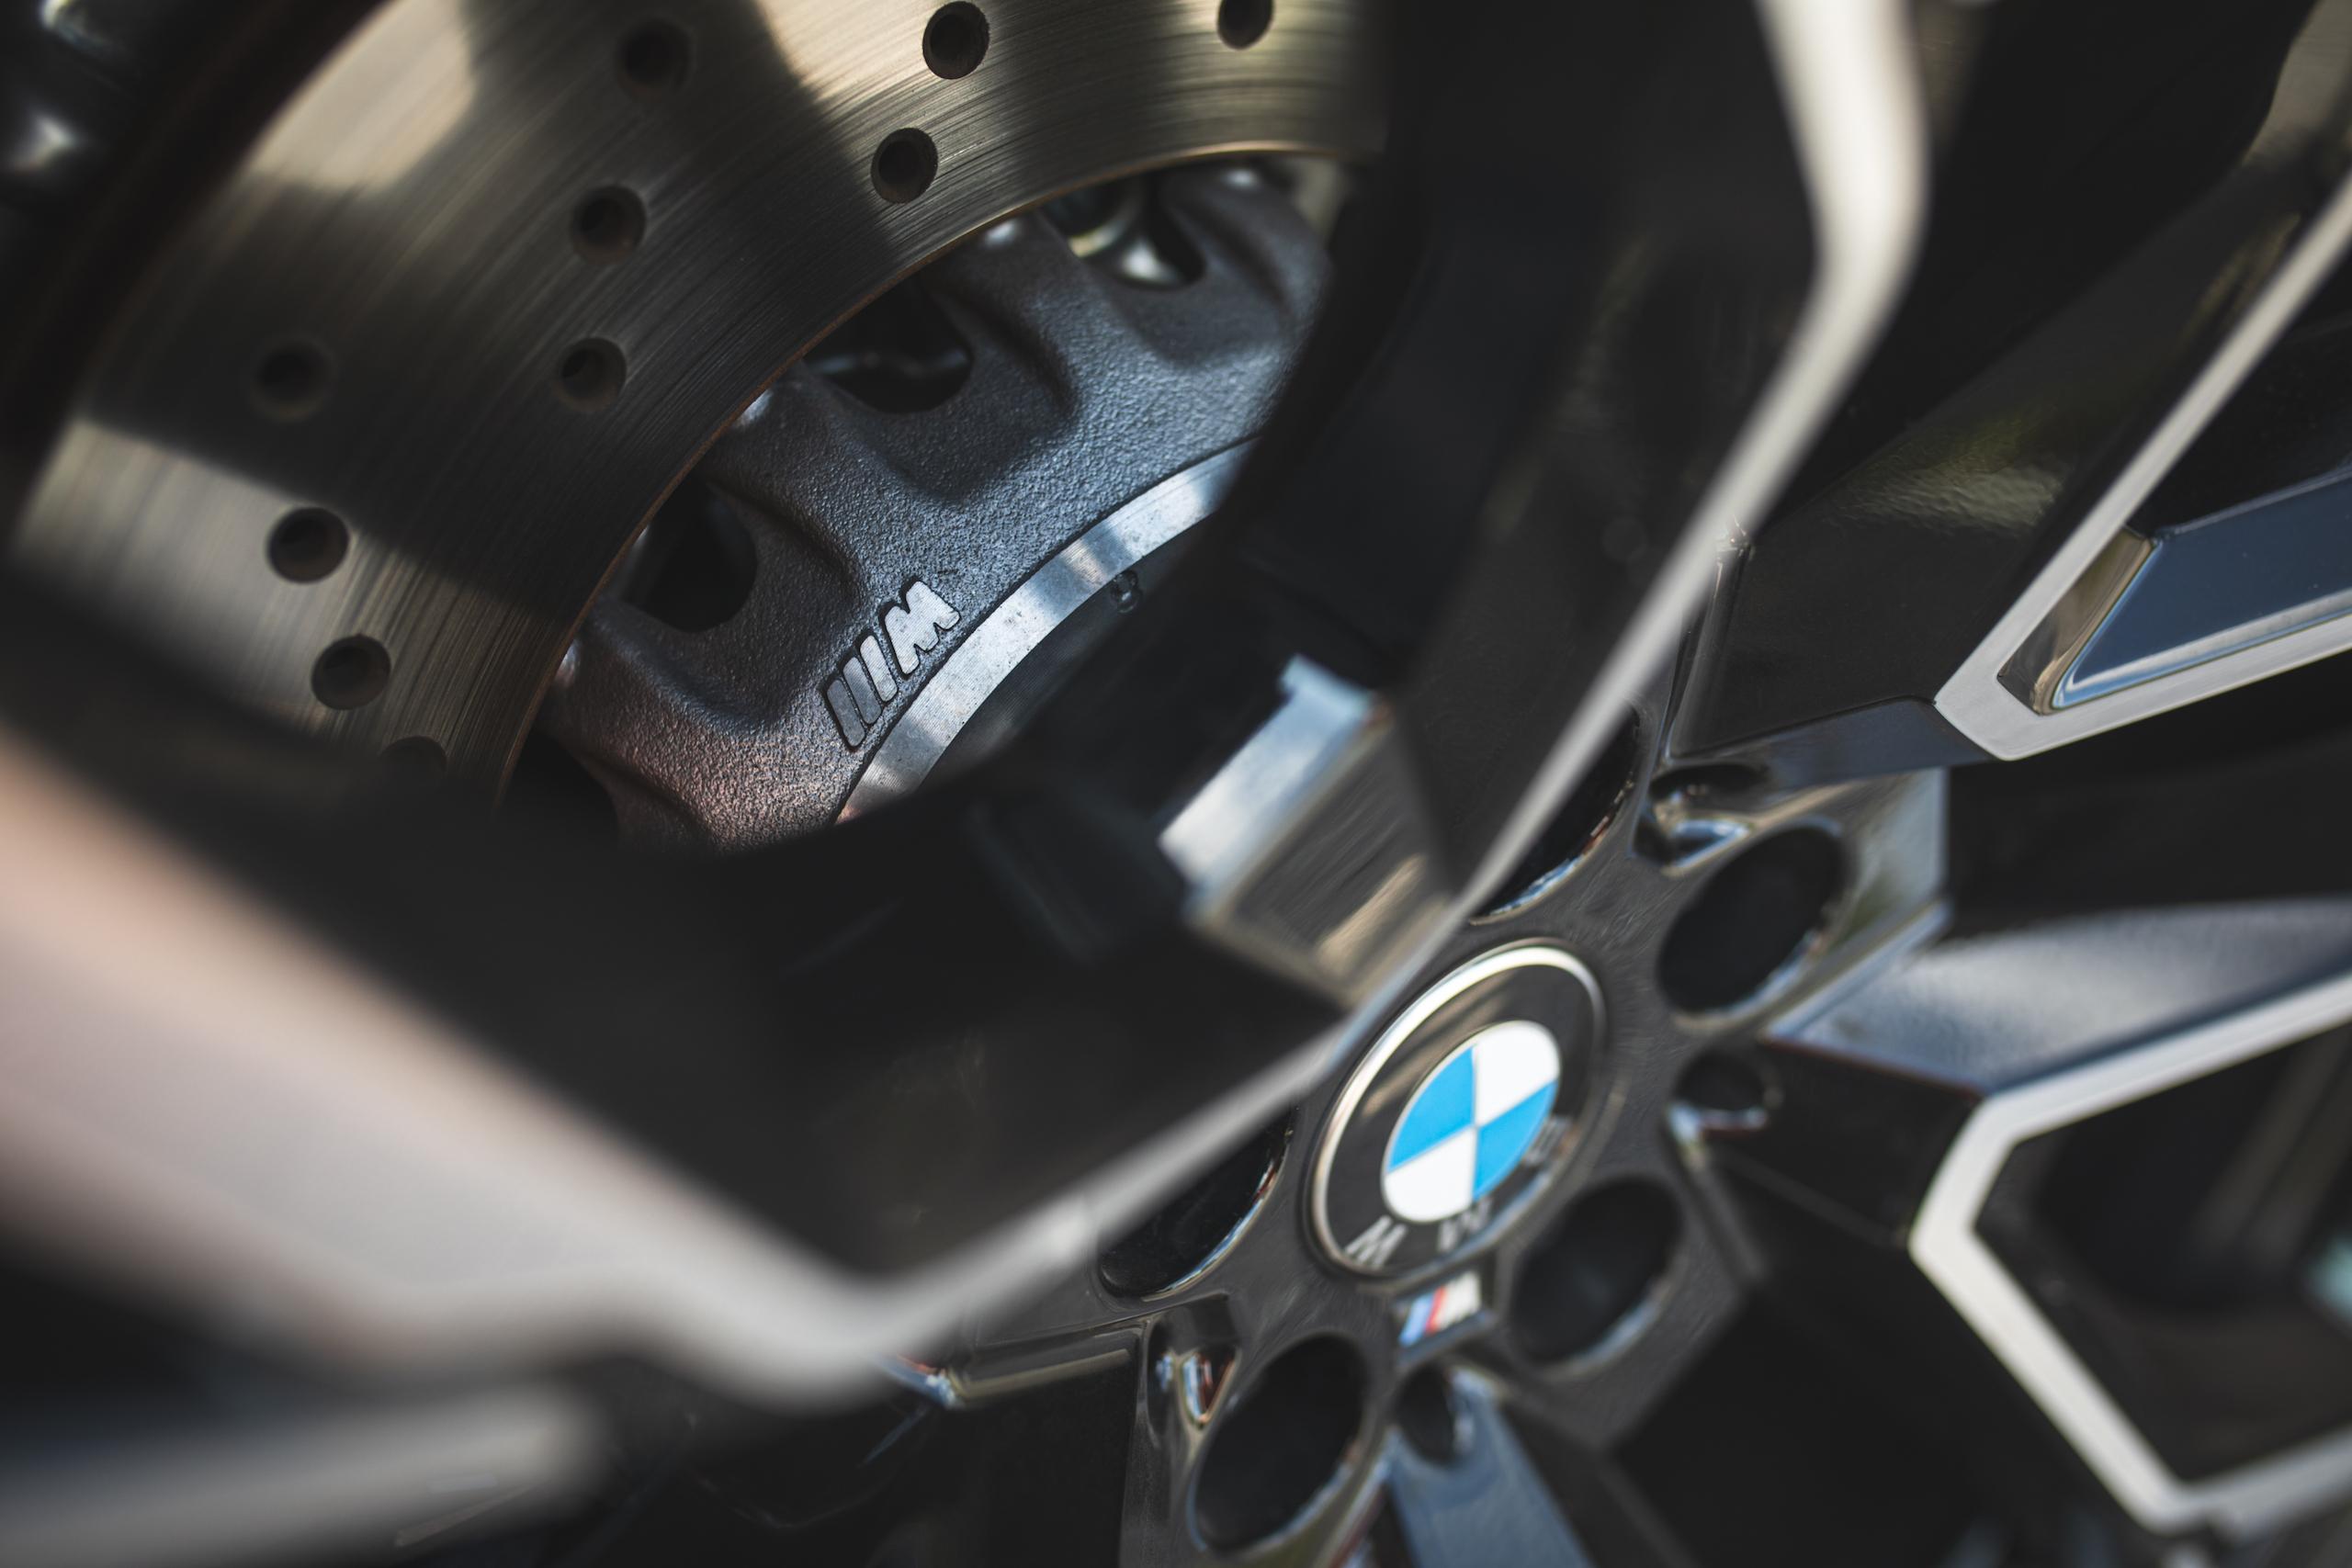 bmw x5m wheel hub caliper detail close